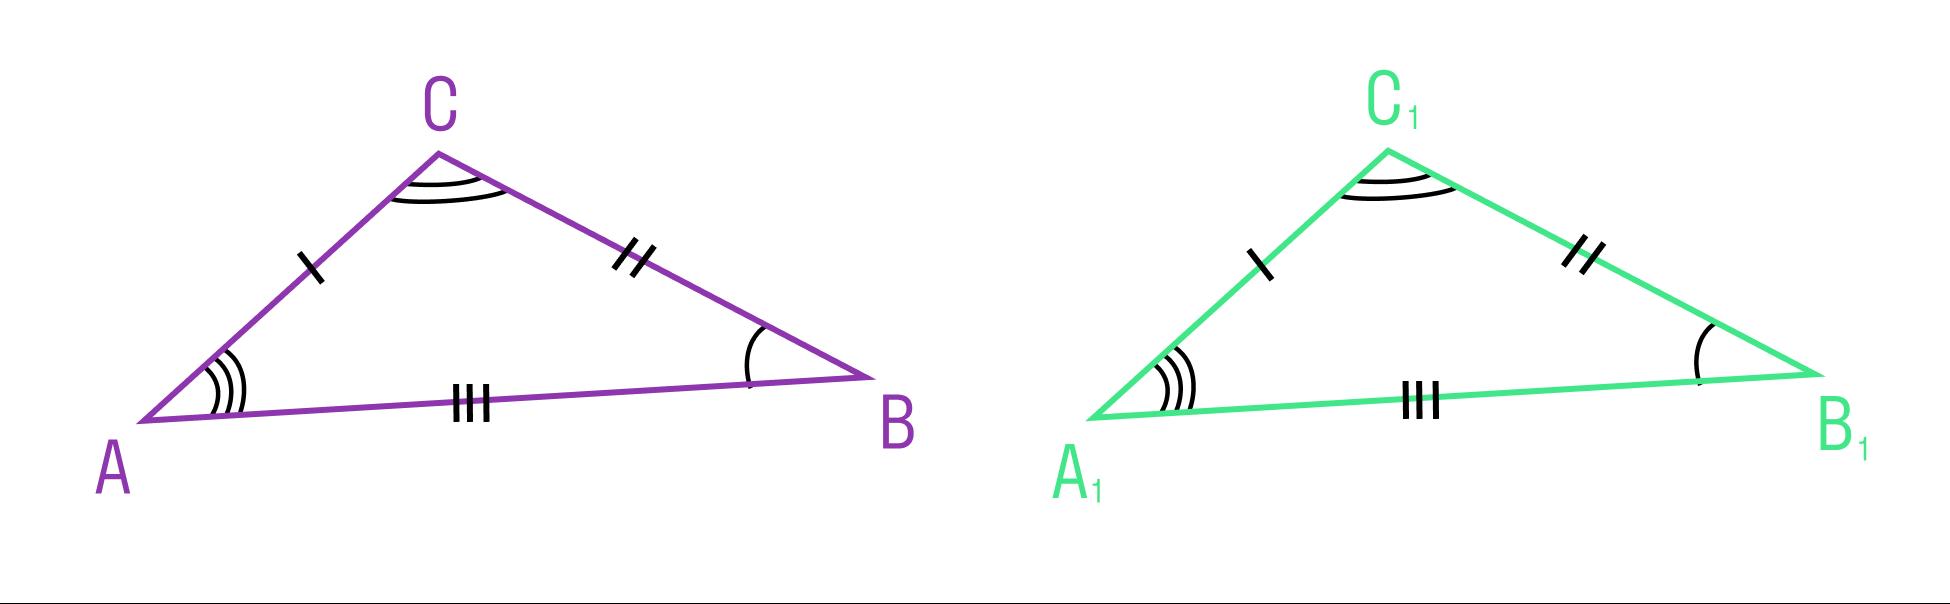 геометрические объекты